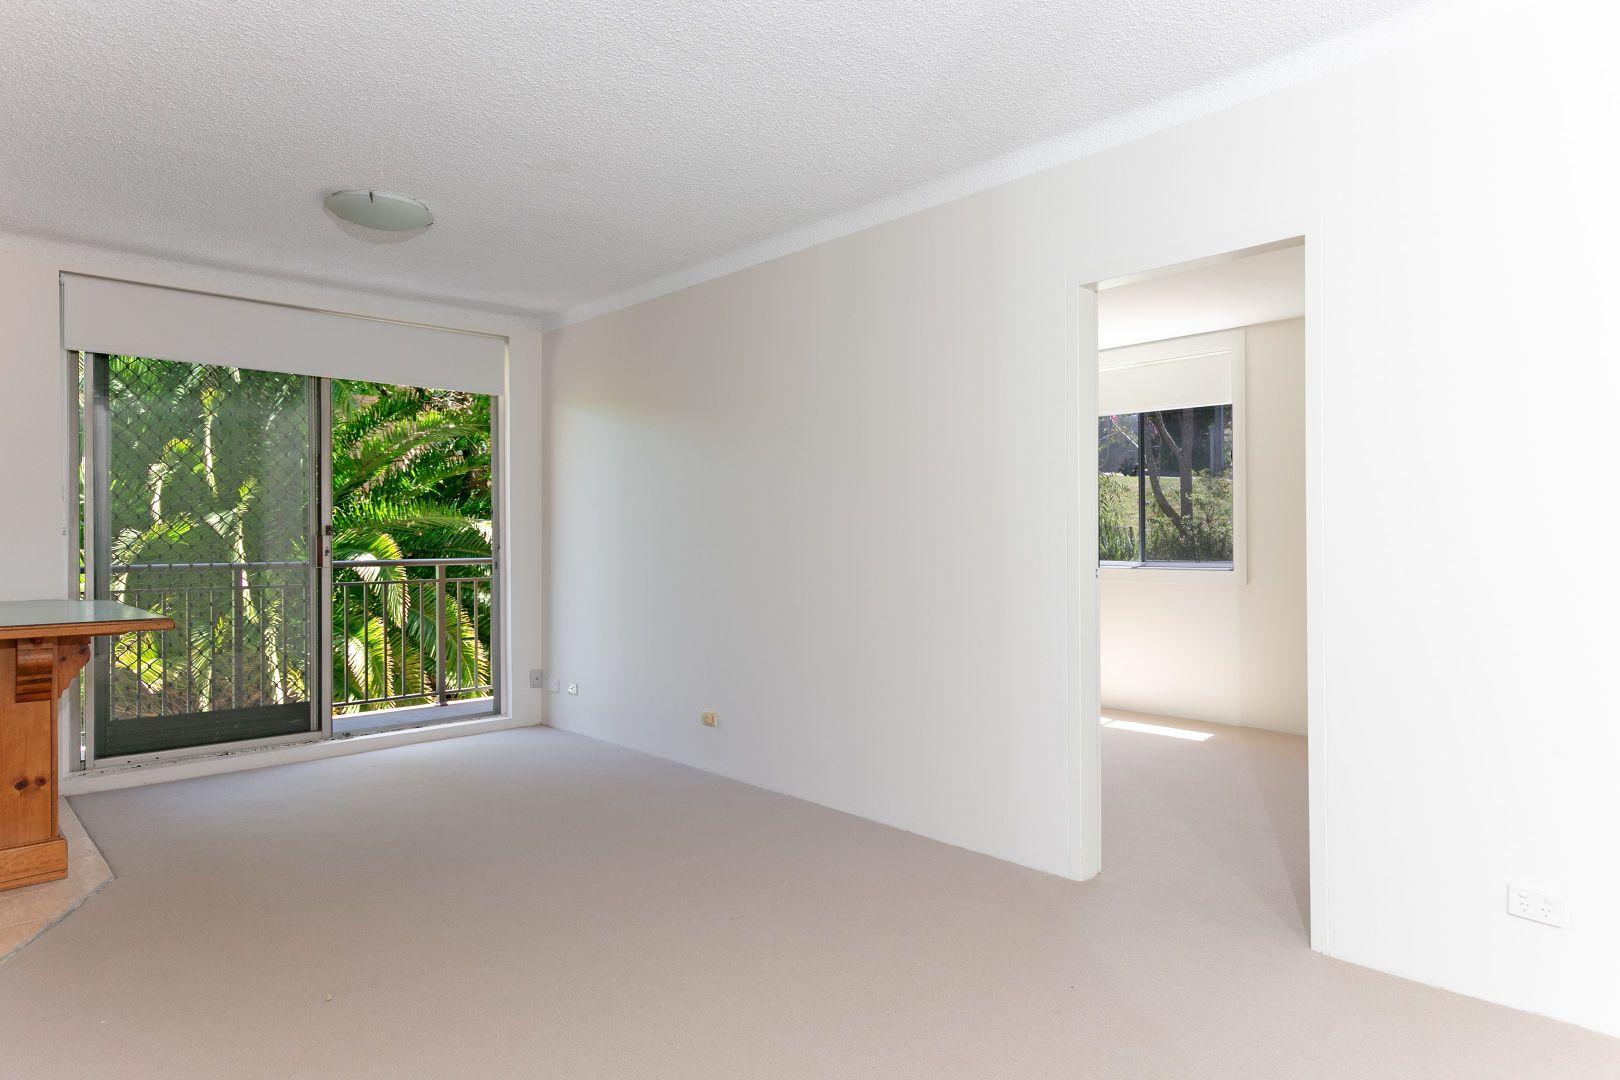 13/26 Waine Street, Freshwater NSW 2096, Image 1